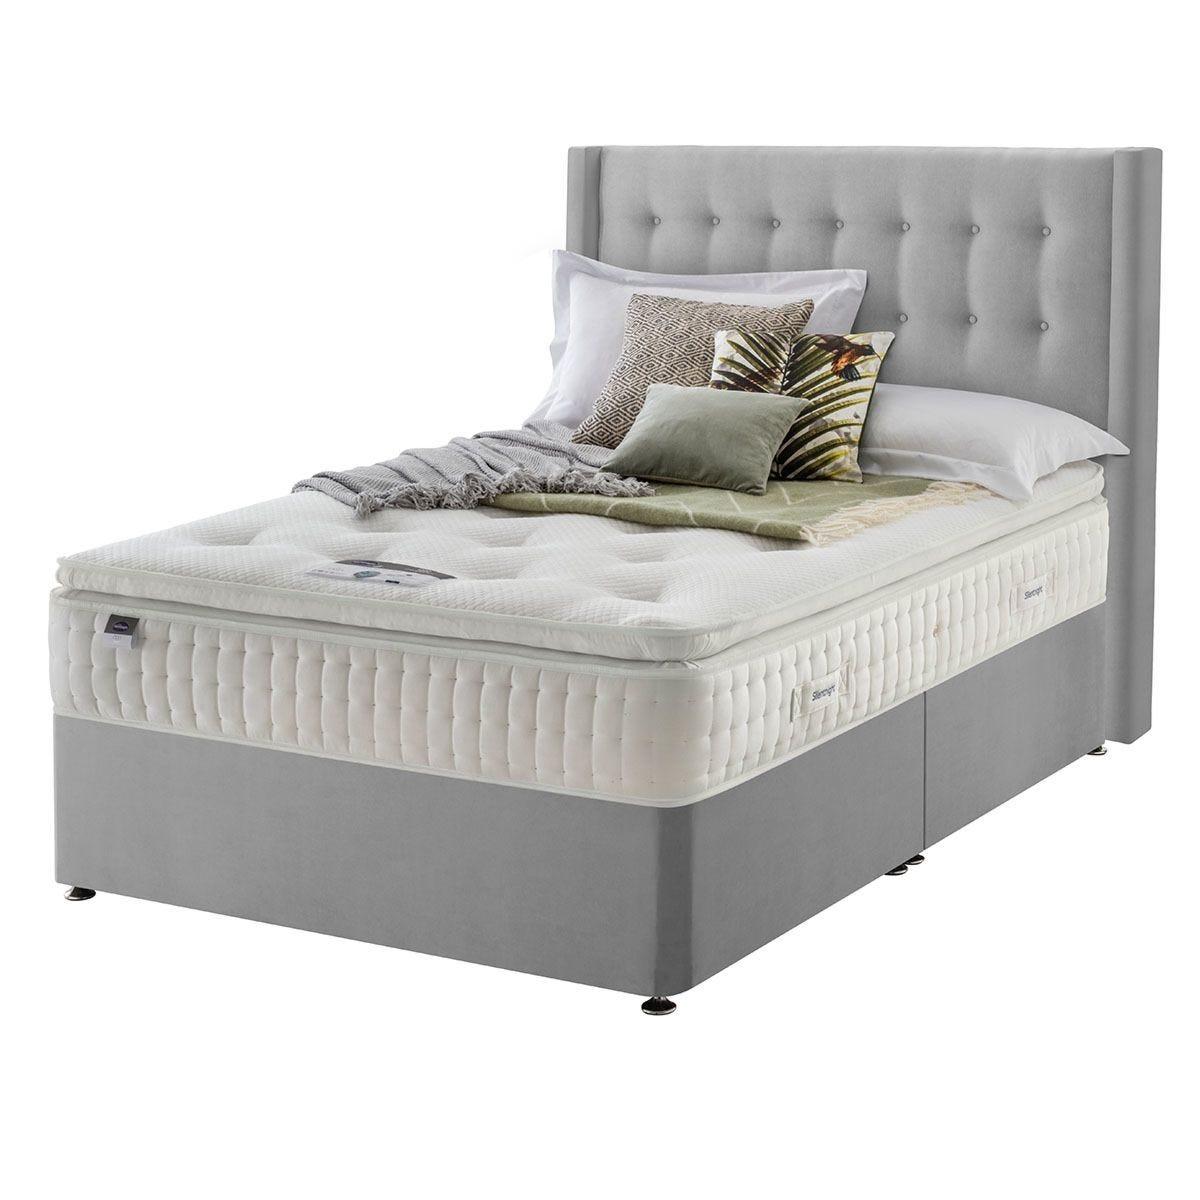 Silentnight Mirapocket Latex 1400 Non Storage Divan Bed - Velvet Silver